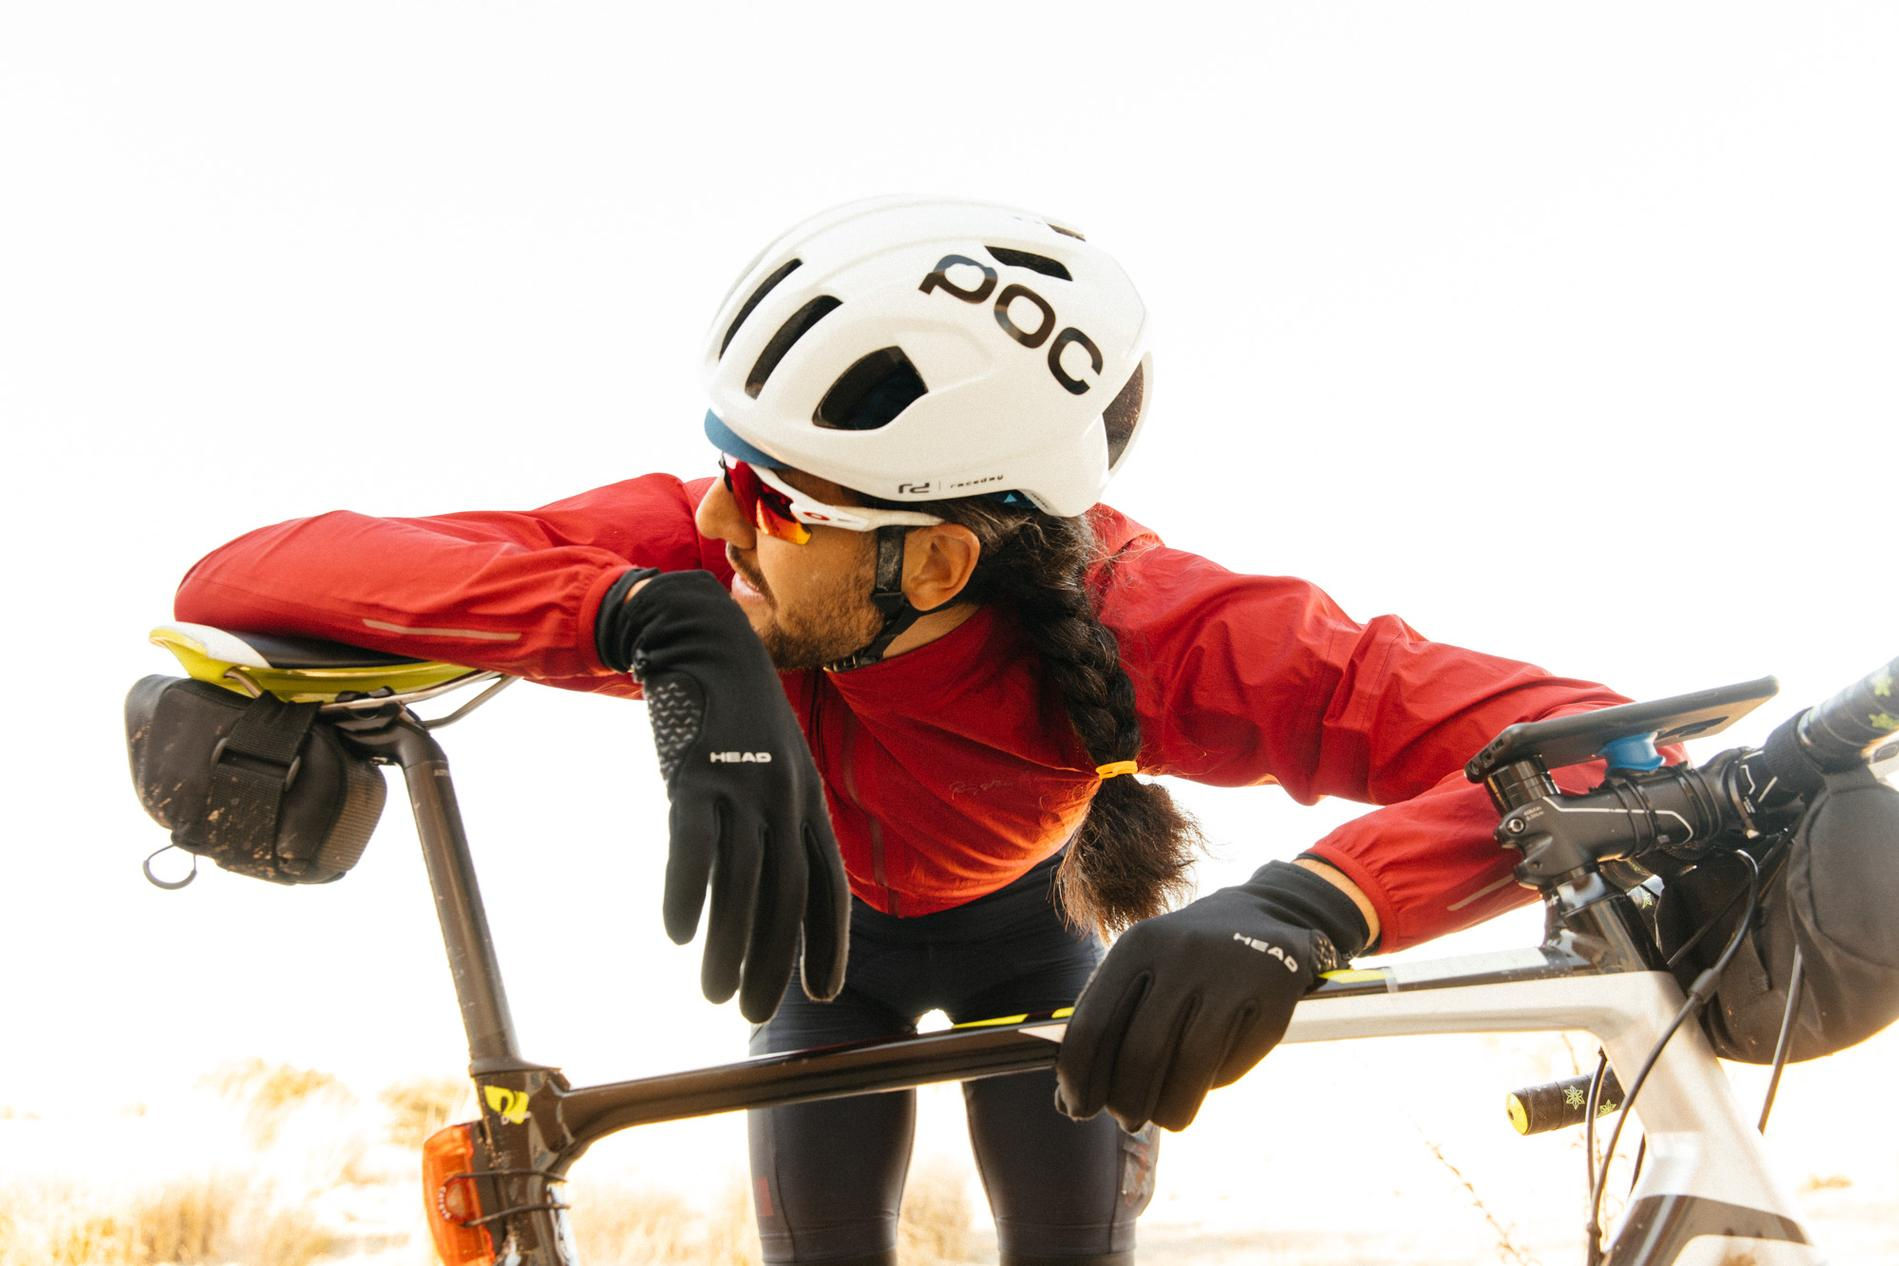 Post-race rider portraits